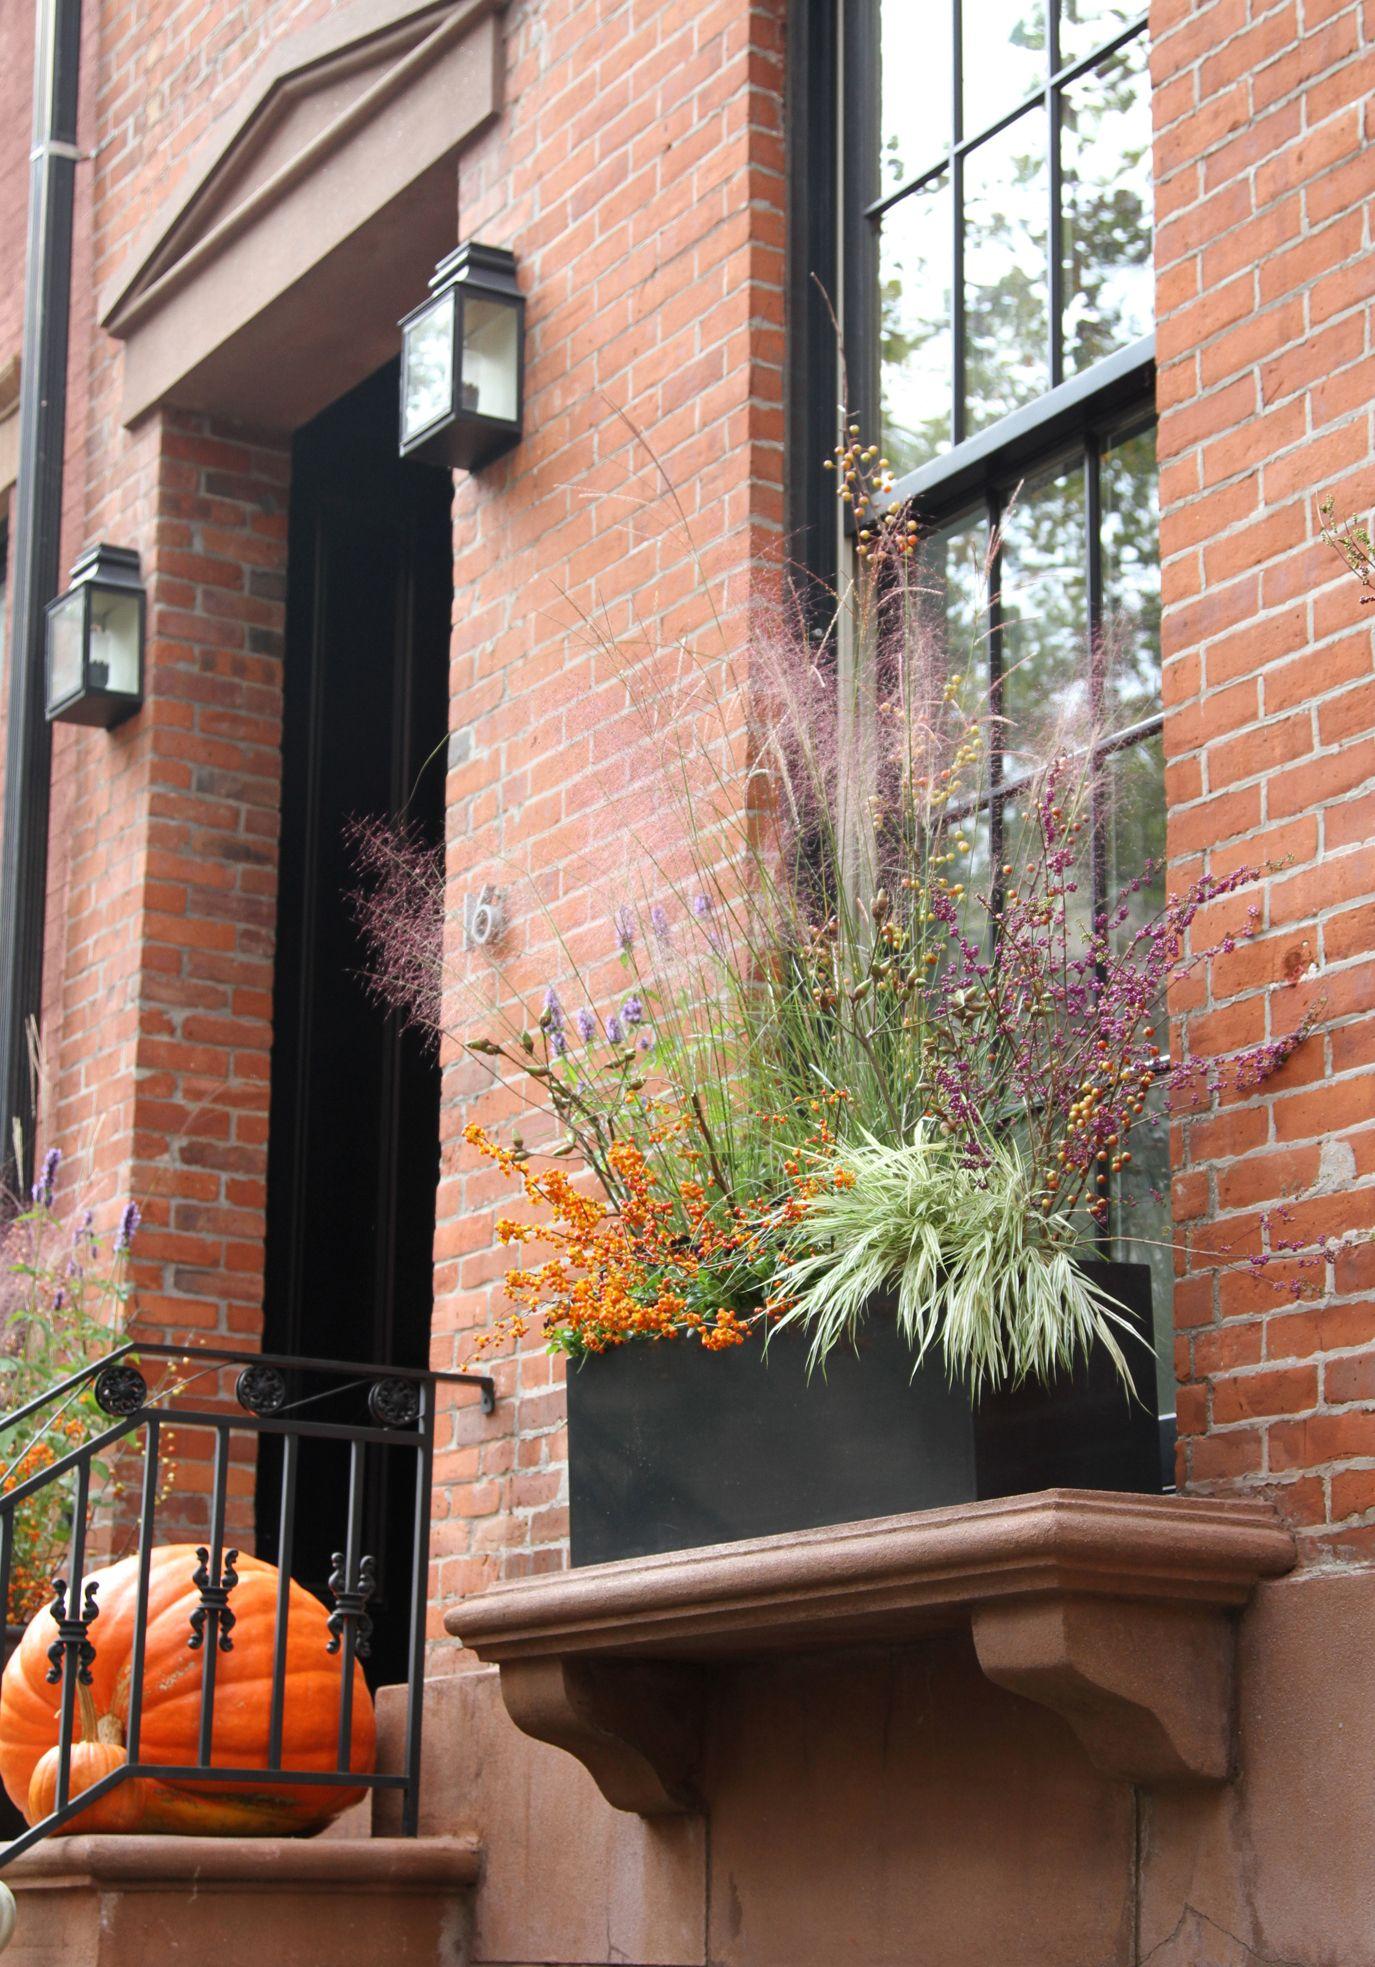 All Gardenista Garden Design Inspiration Stories In One Place. Fall PlantersHanging  PlantersOutdoor ...